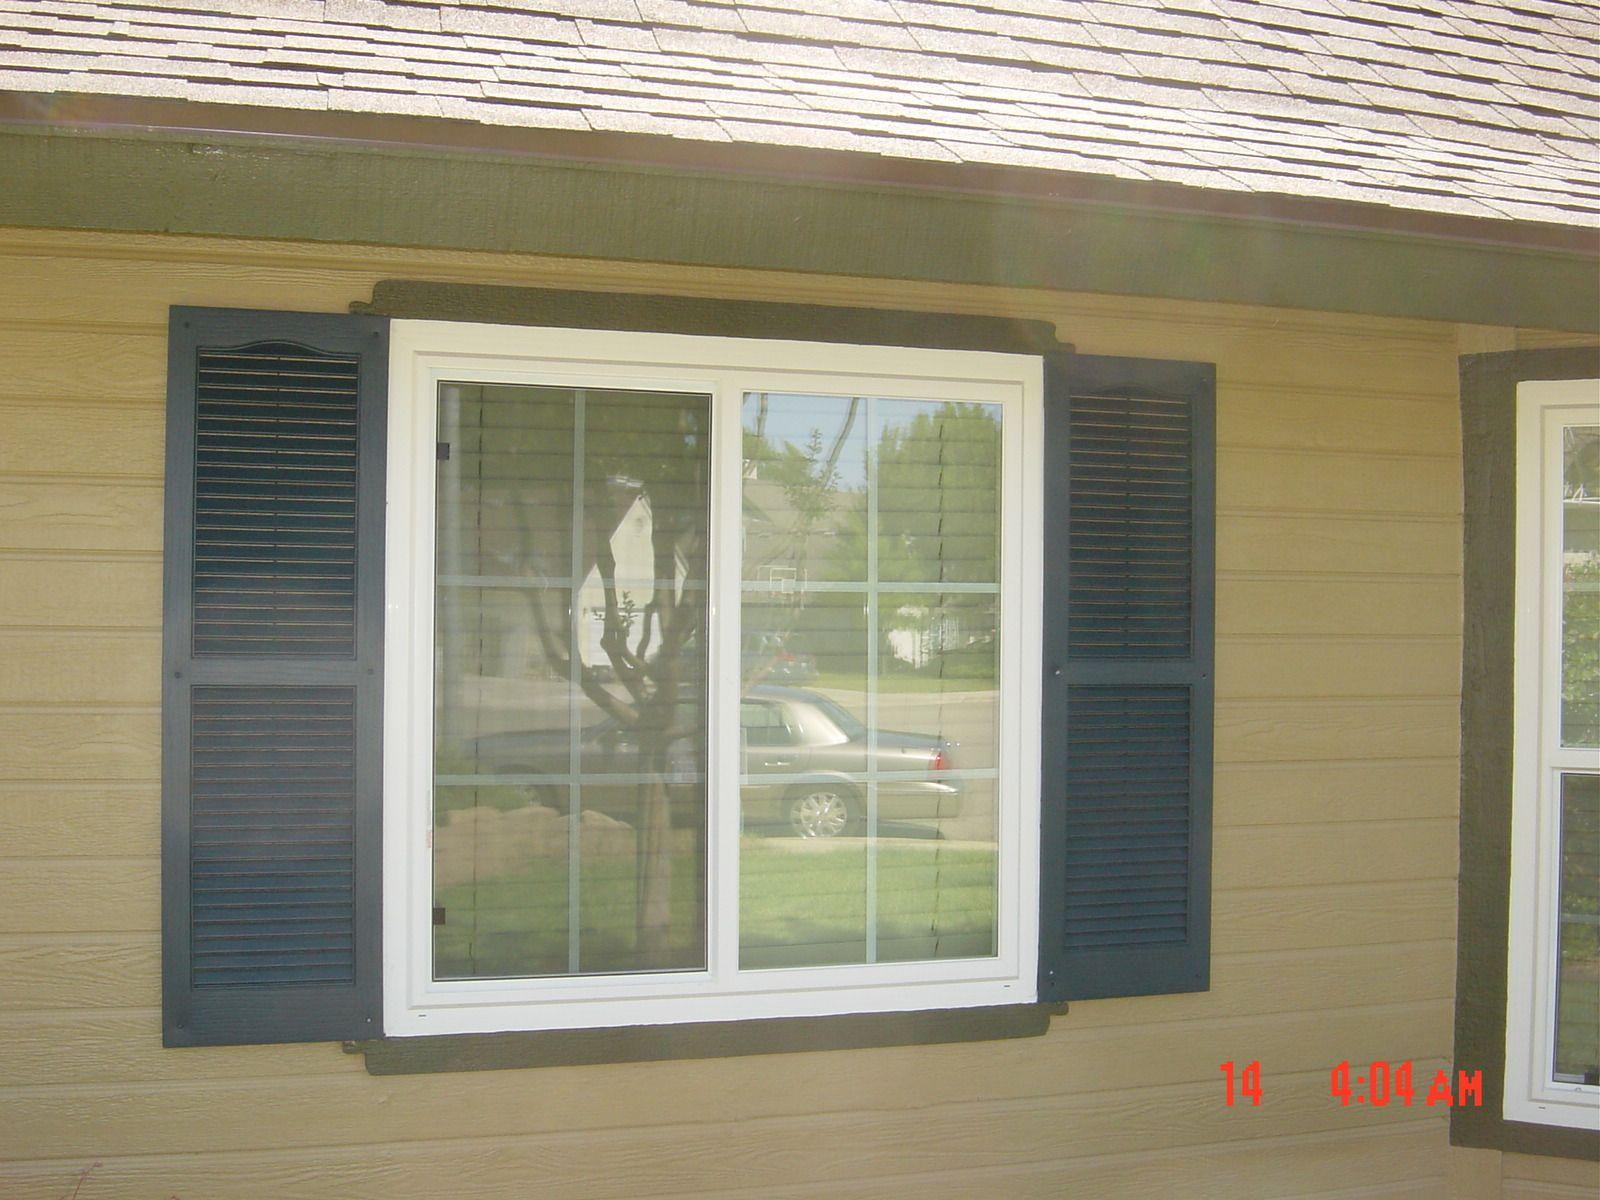 Anlin Windows Installed By Jz Construction Clovis Ca 93611 Windows Window Styles Replace Door